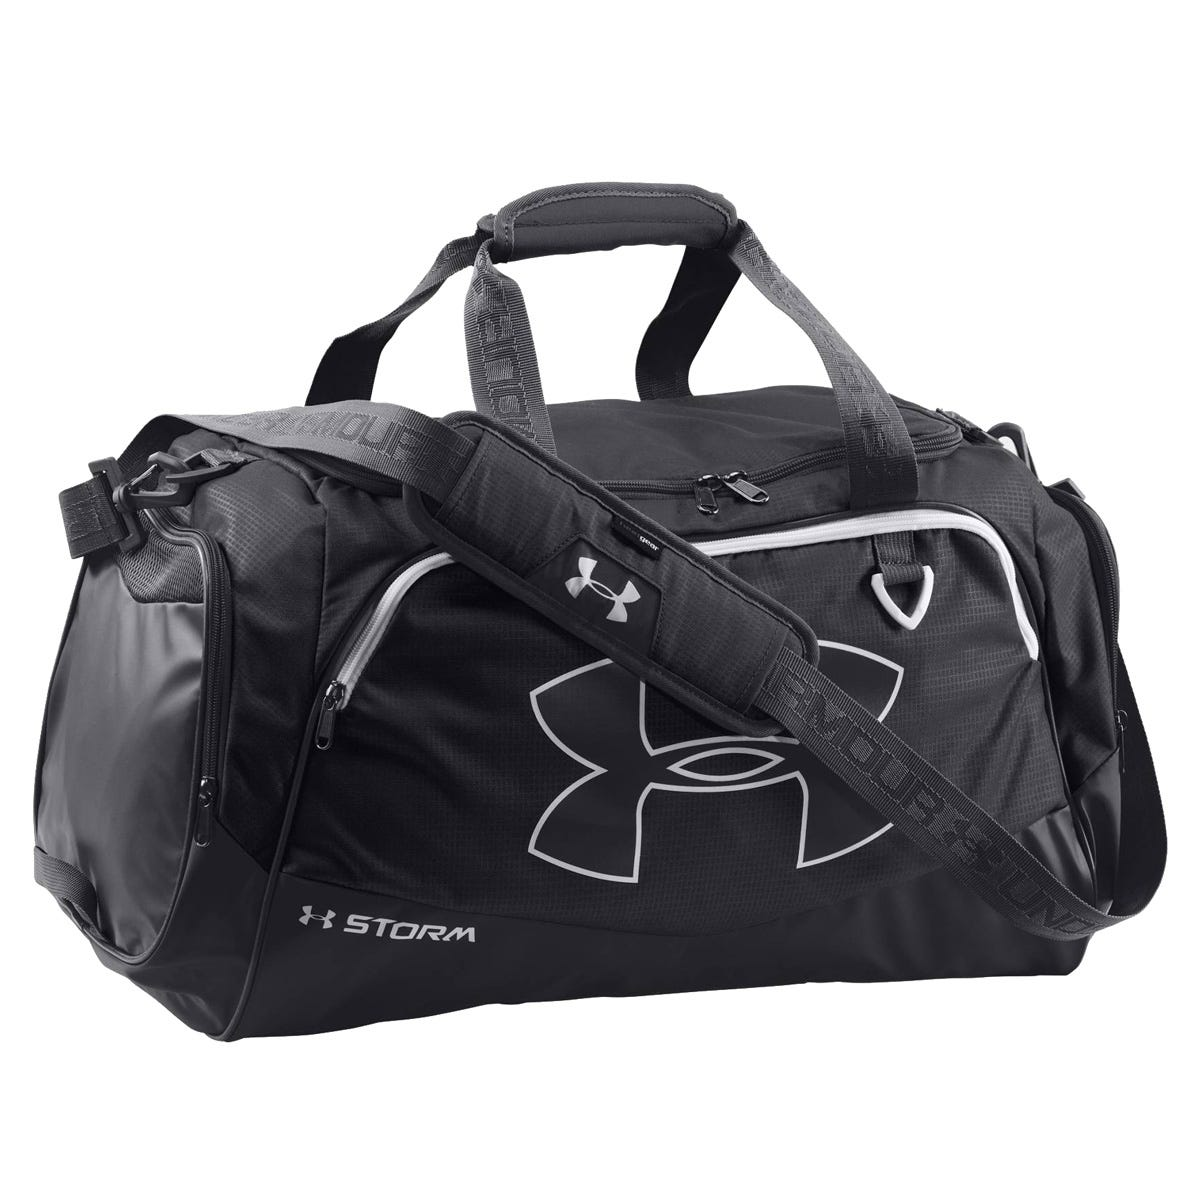 Under Armour Team Undeniable Medium Duffle Bag